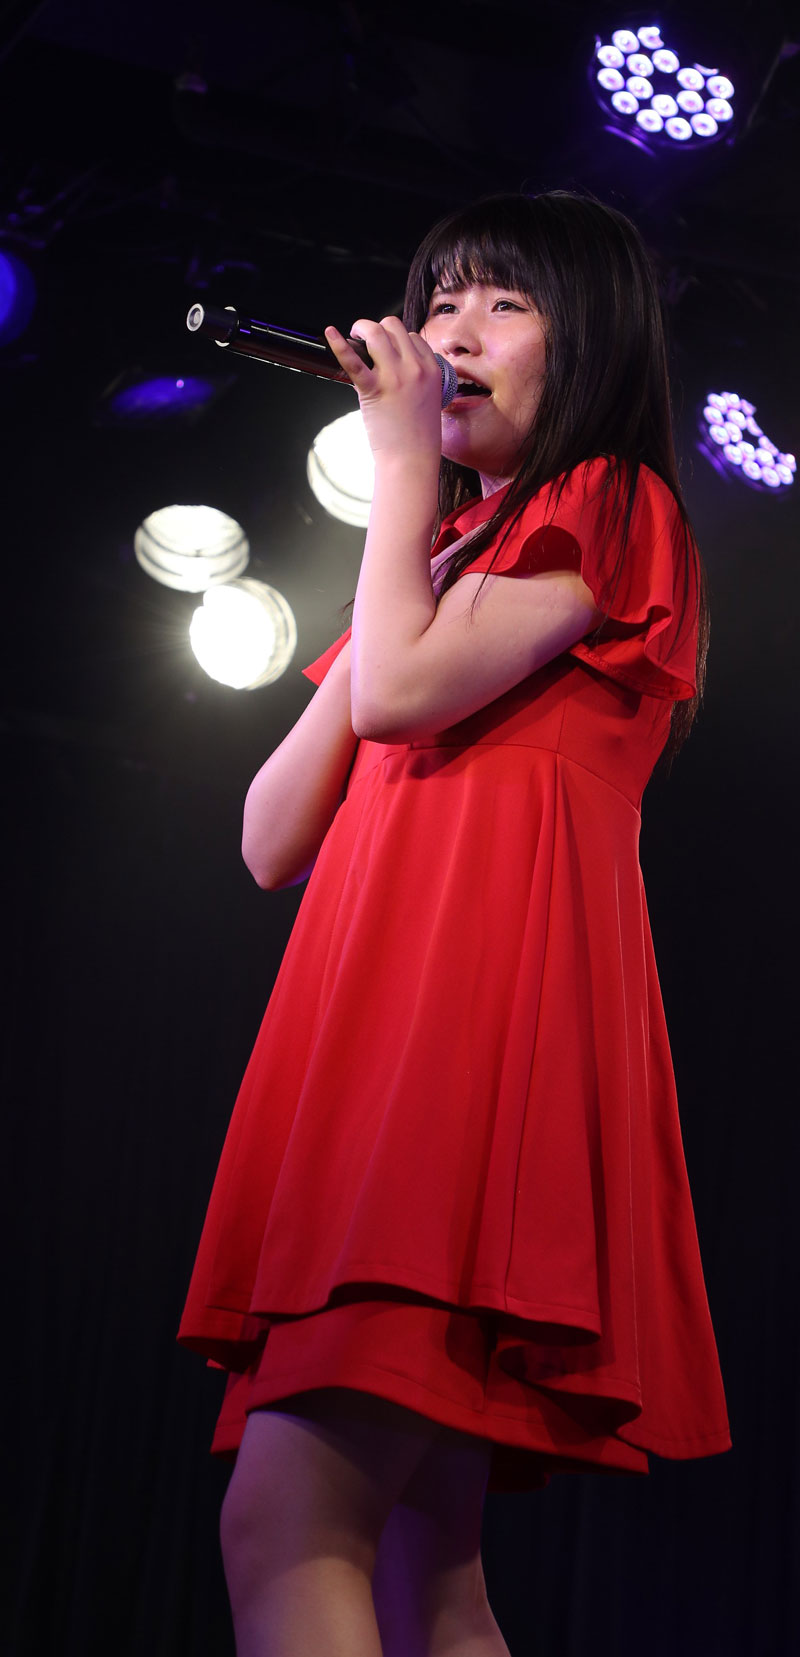 Images : 18番目の画像 - 7月30日にAKIBAカルチャーズ劇場で開催された「定期公演第七片」より - Stereo Sound ONLINE